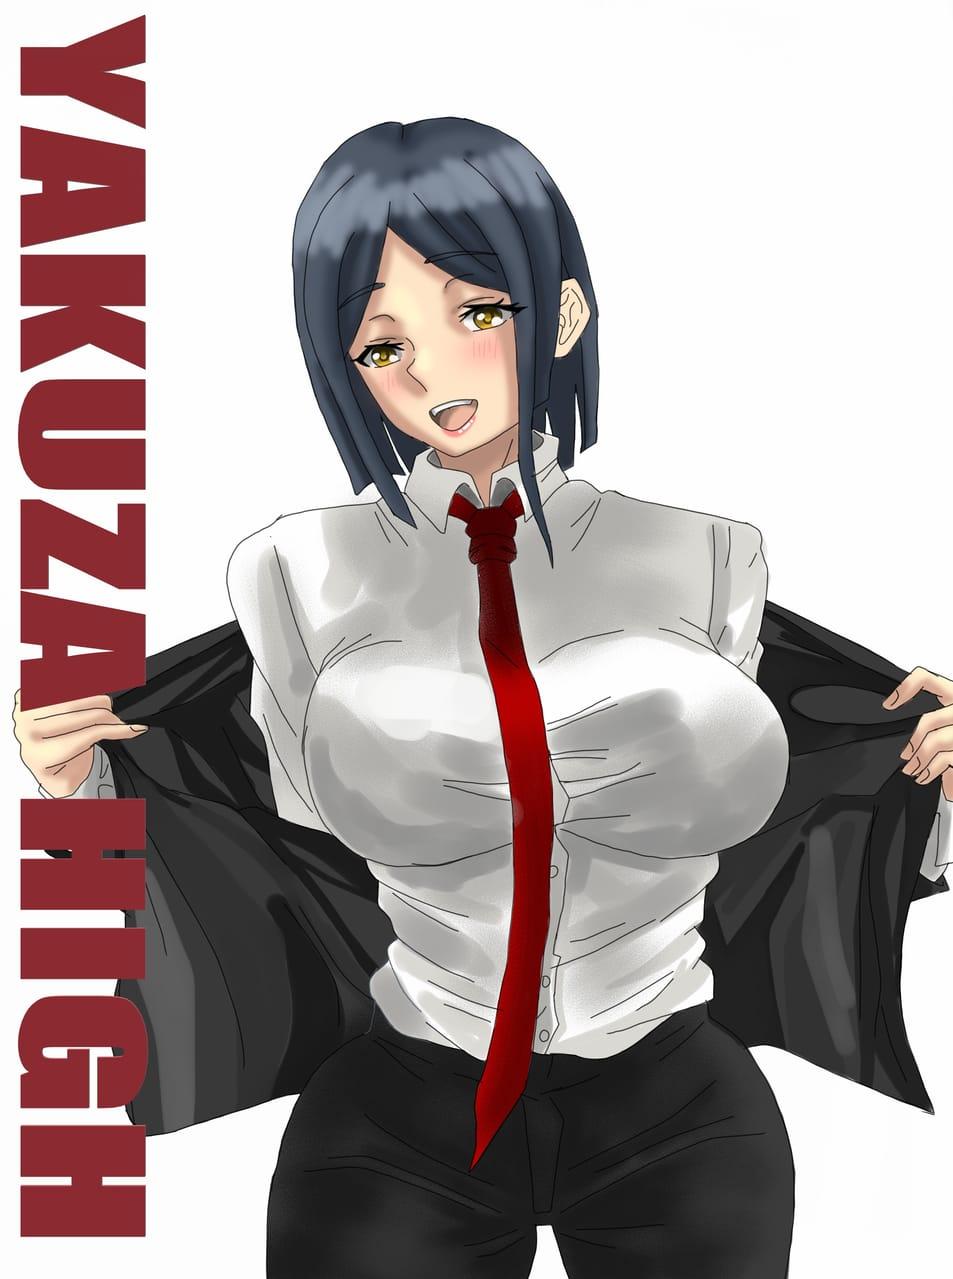 Teresa sensei 3. Illust of Yuri Black Zero cute painting sexy Beautiful medibangpaint illustration Hot color